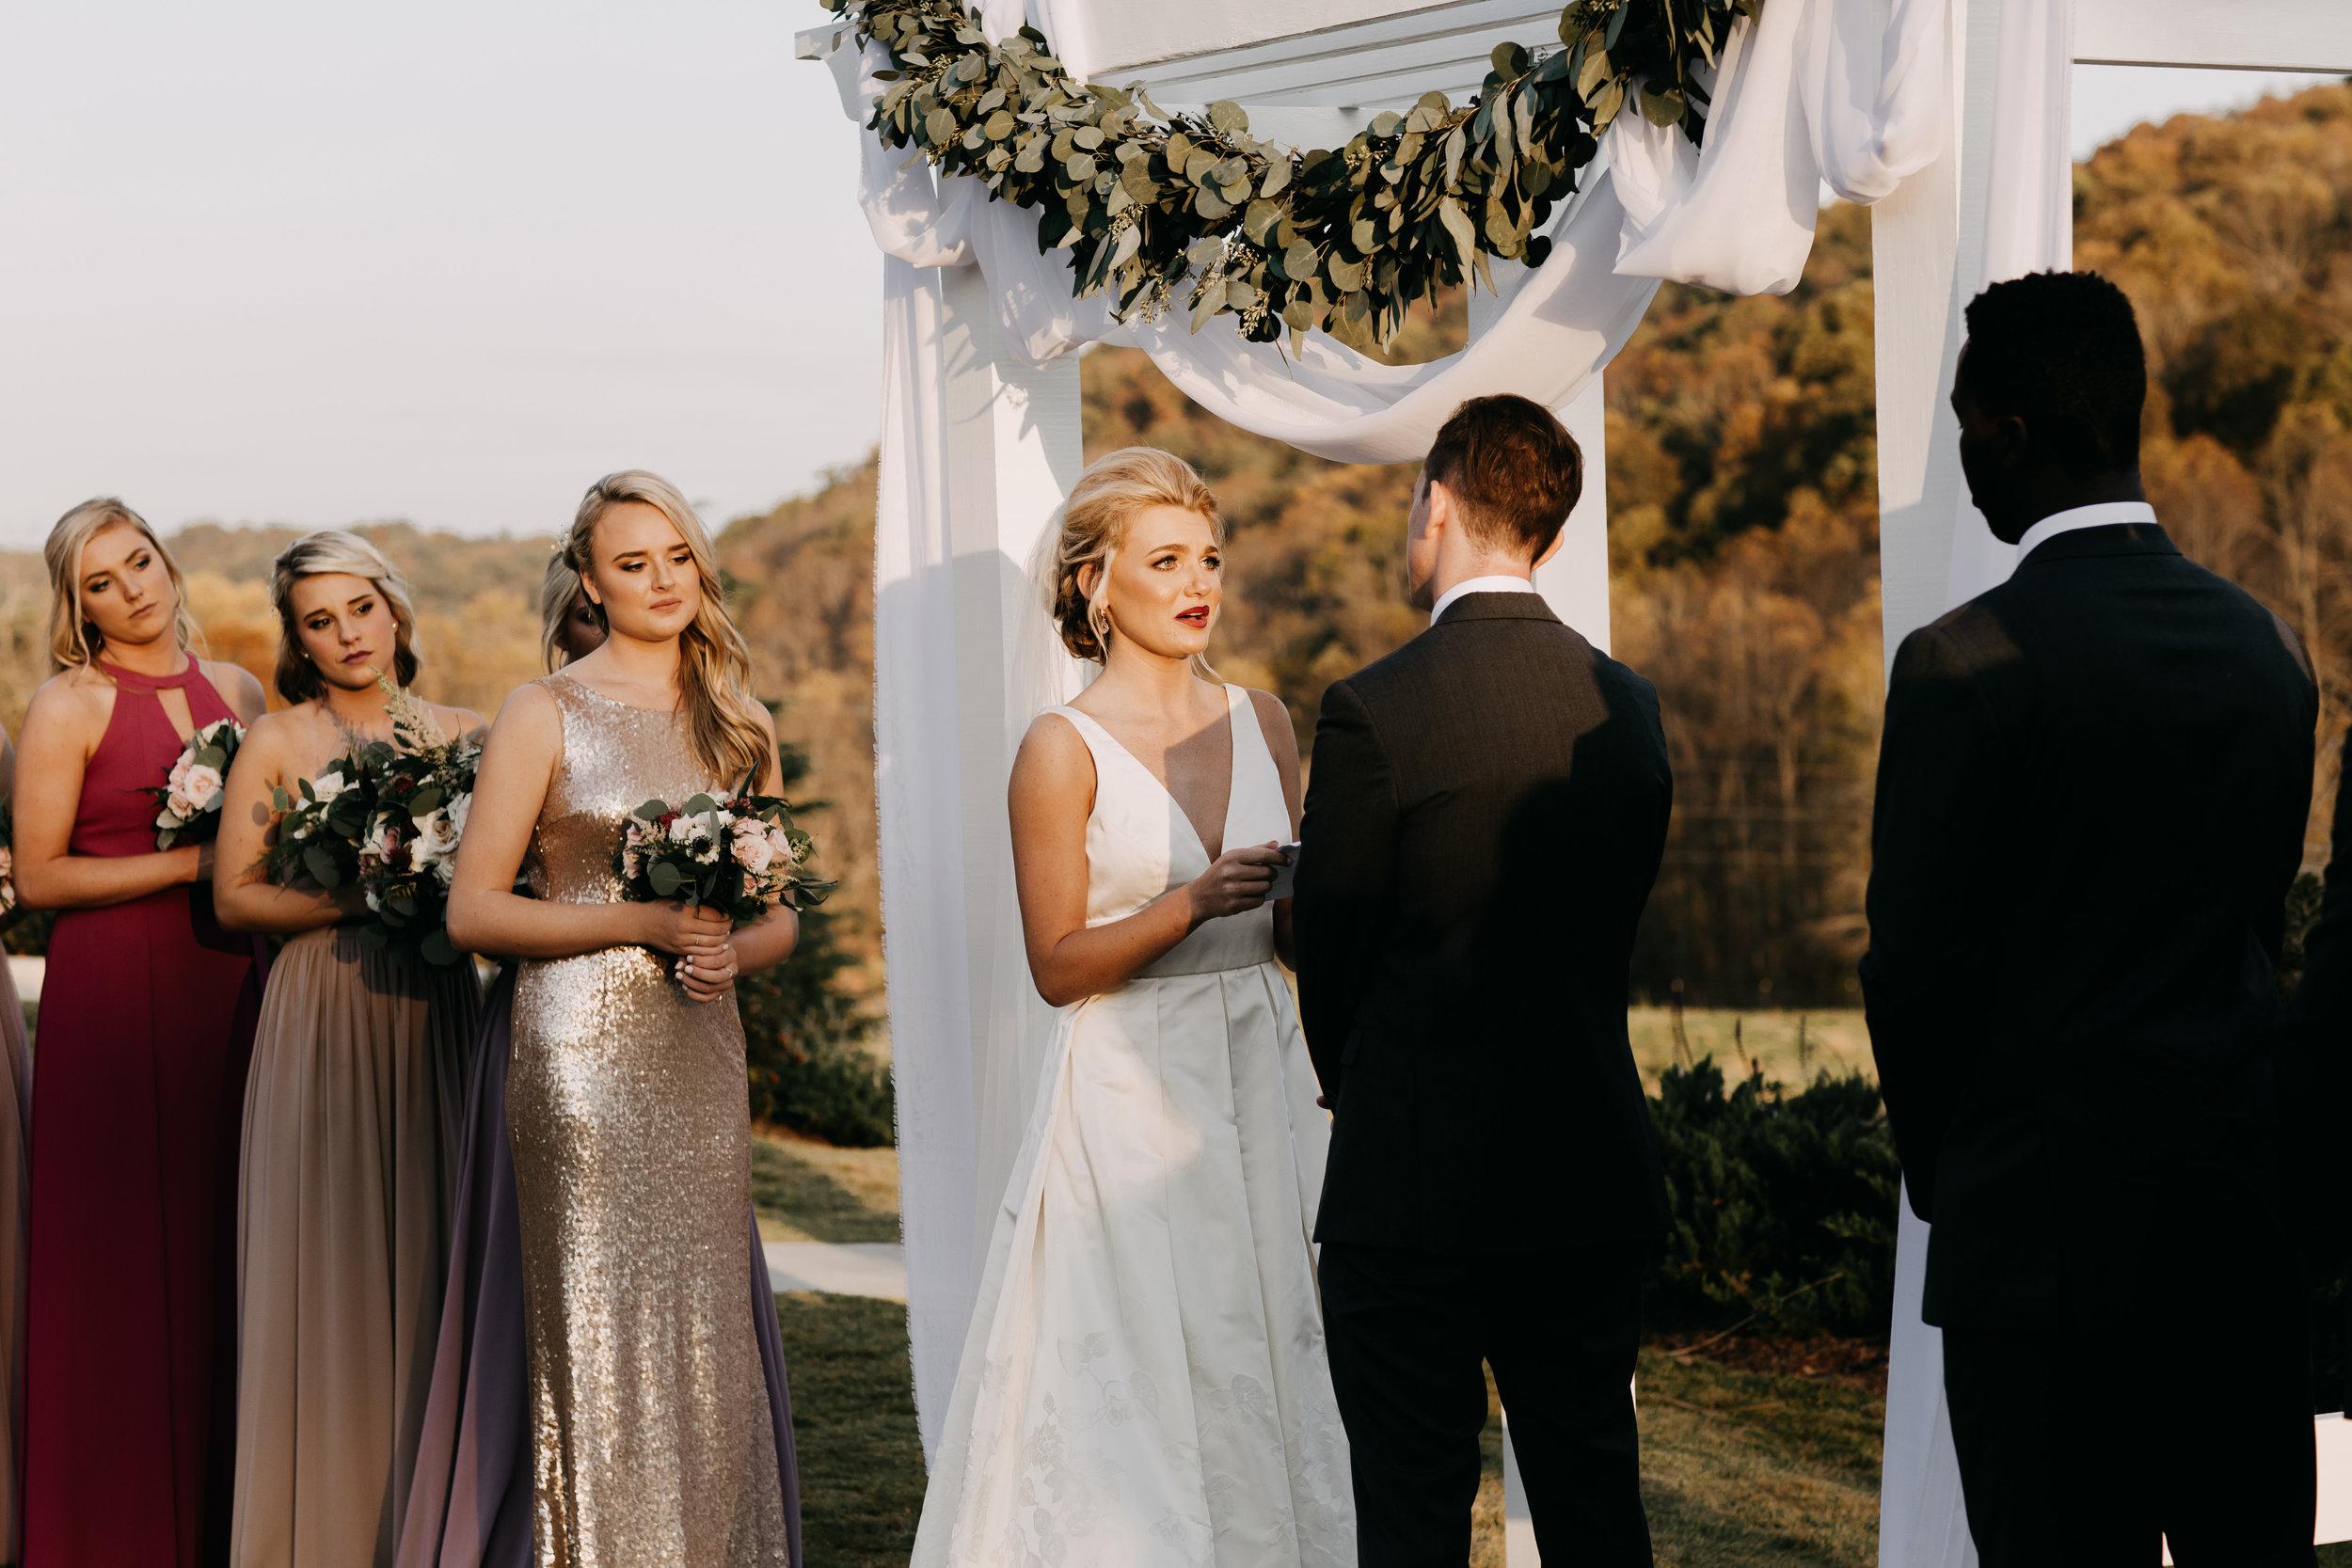 Kaylyn & Ryan Final Wedding Photos363.jpg